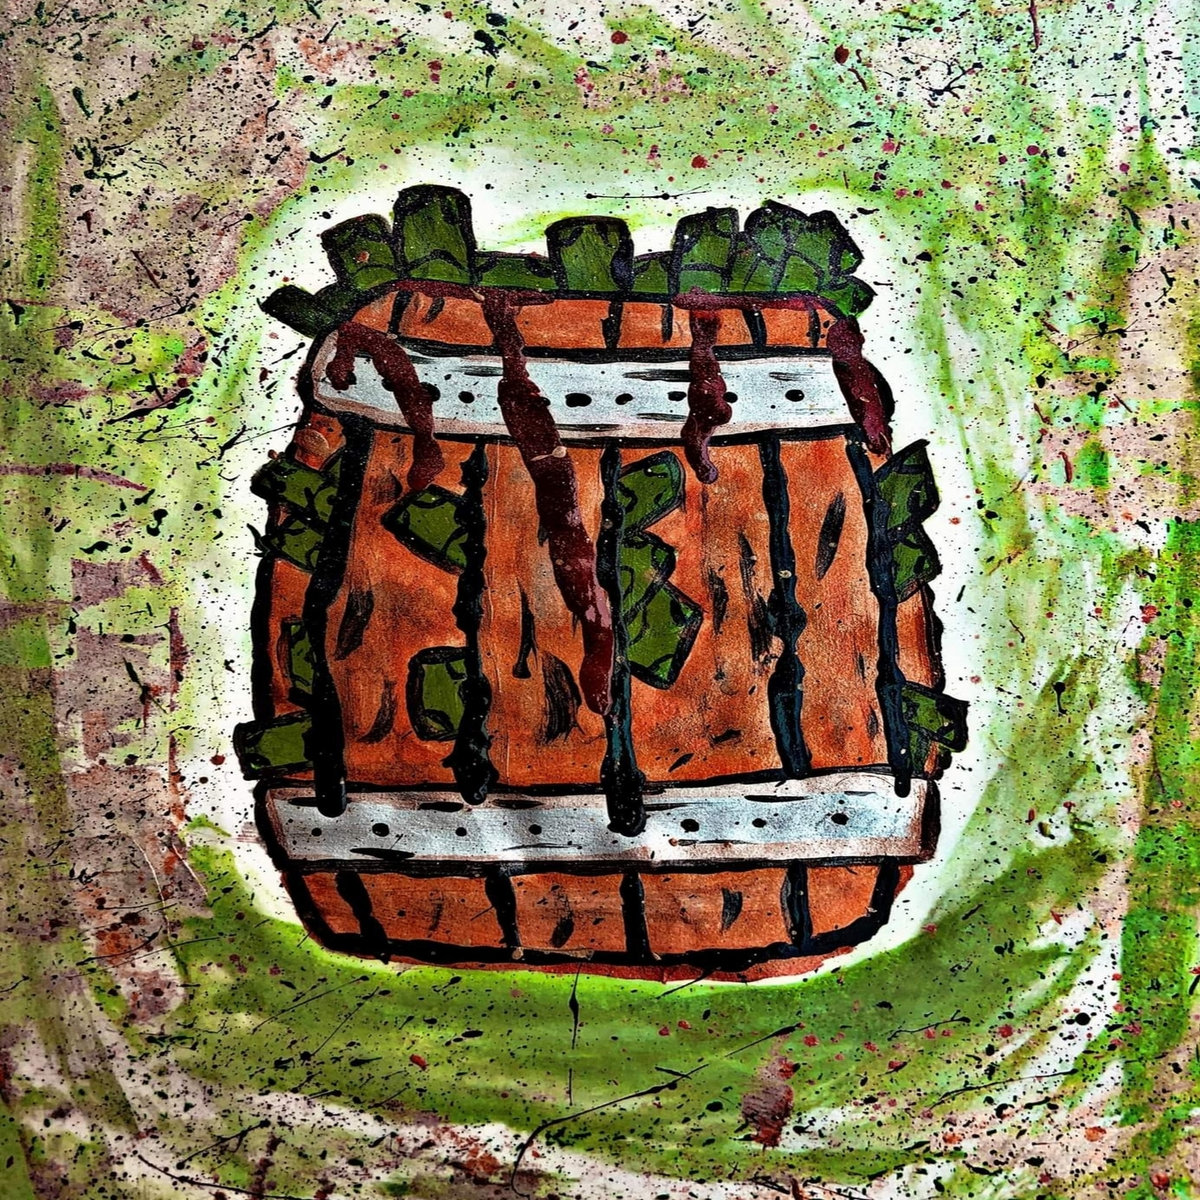 THEMELLOS - BILLIONDOLLARBARREL VOLUME 2 EP